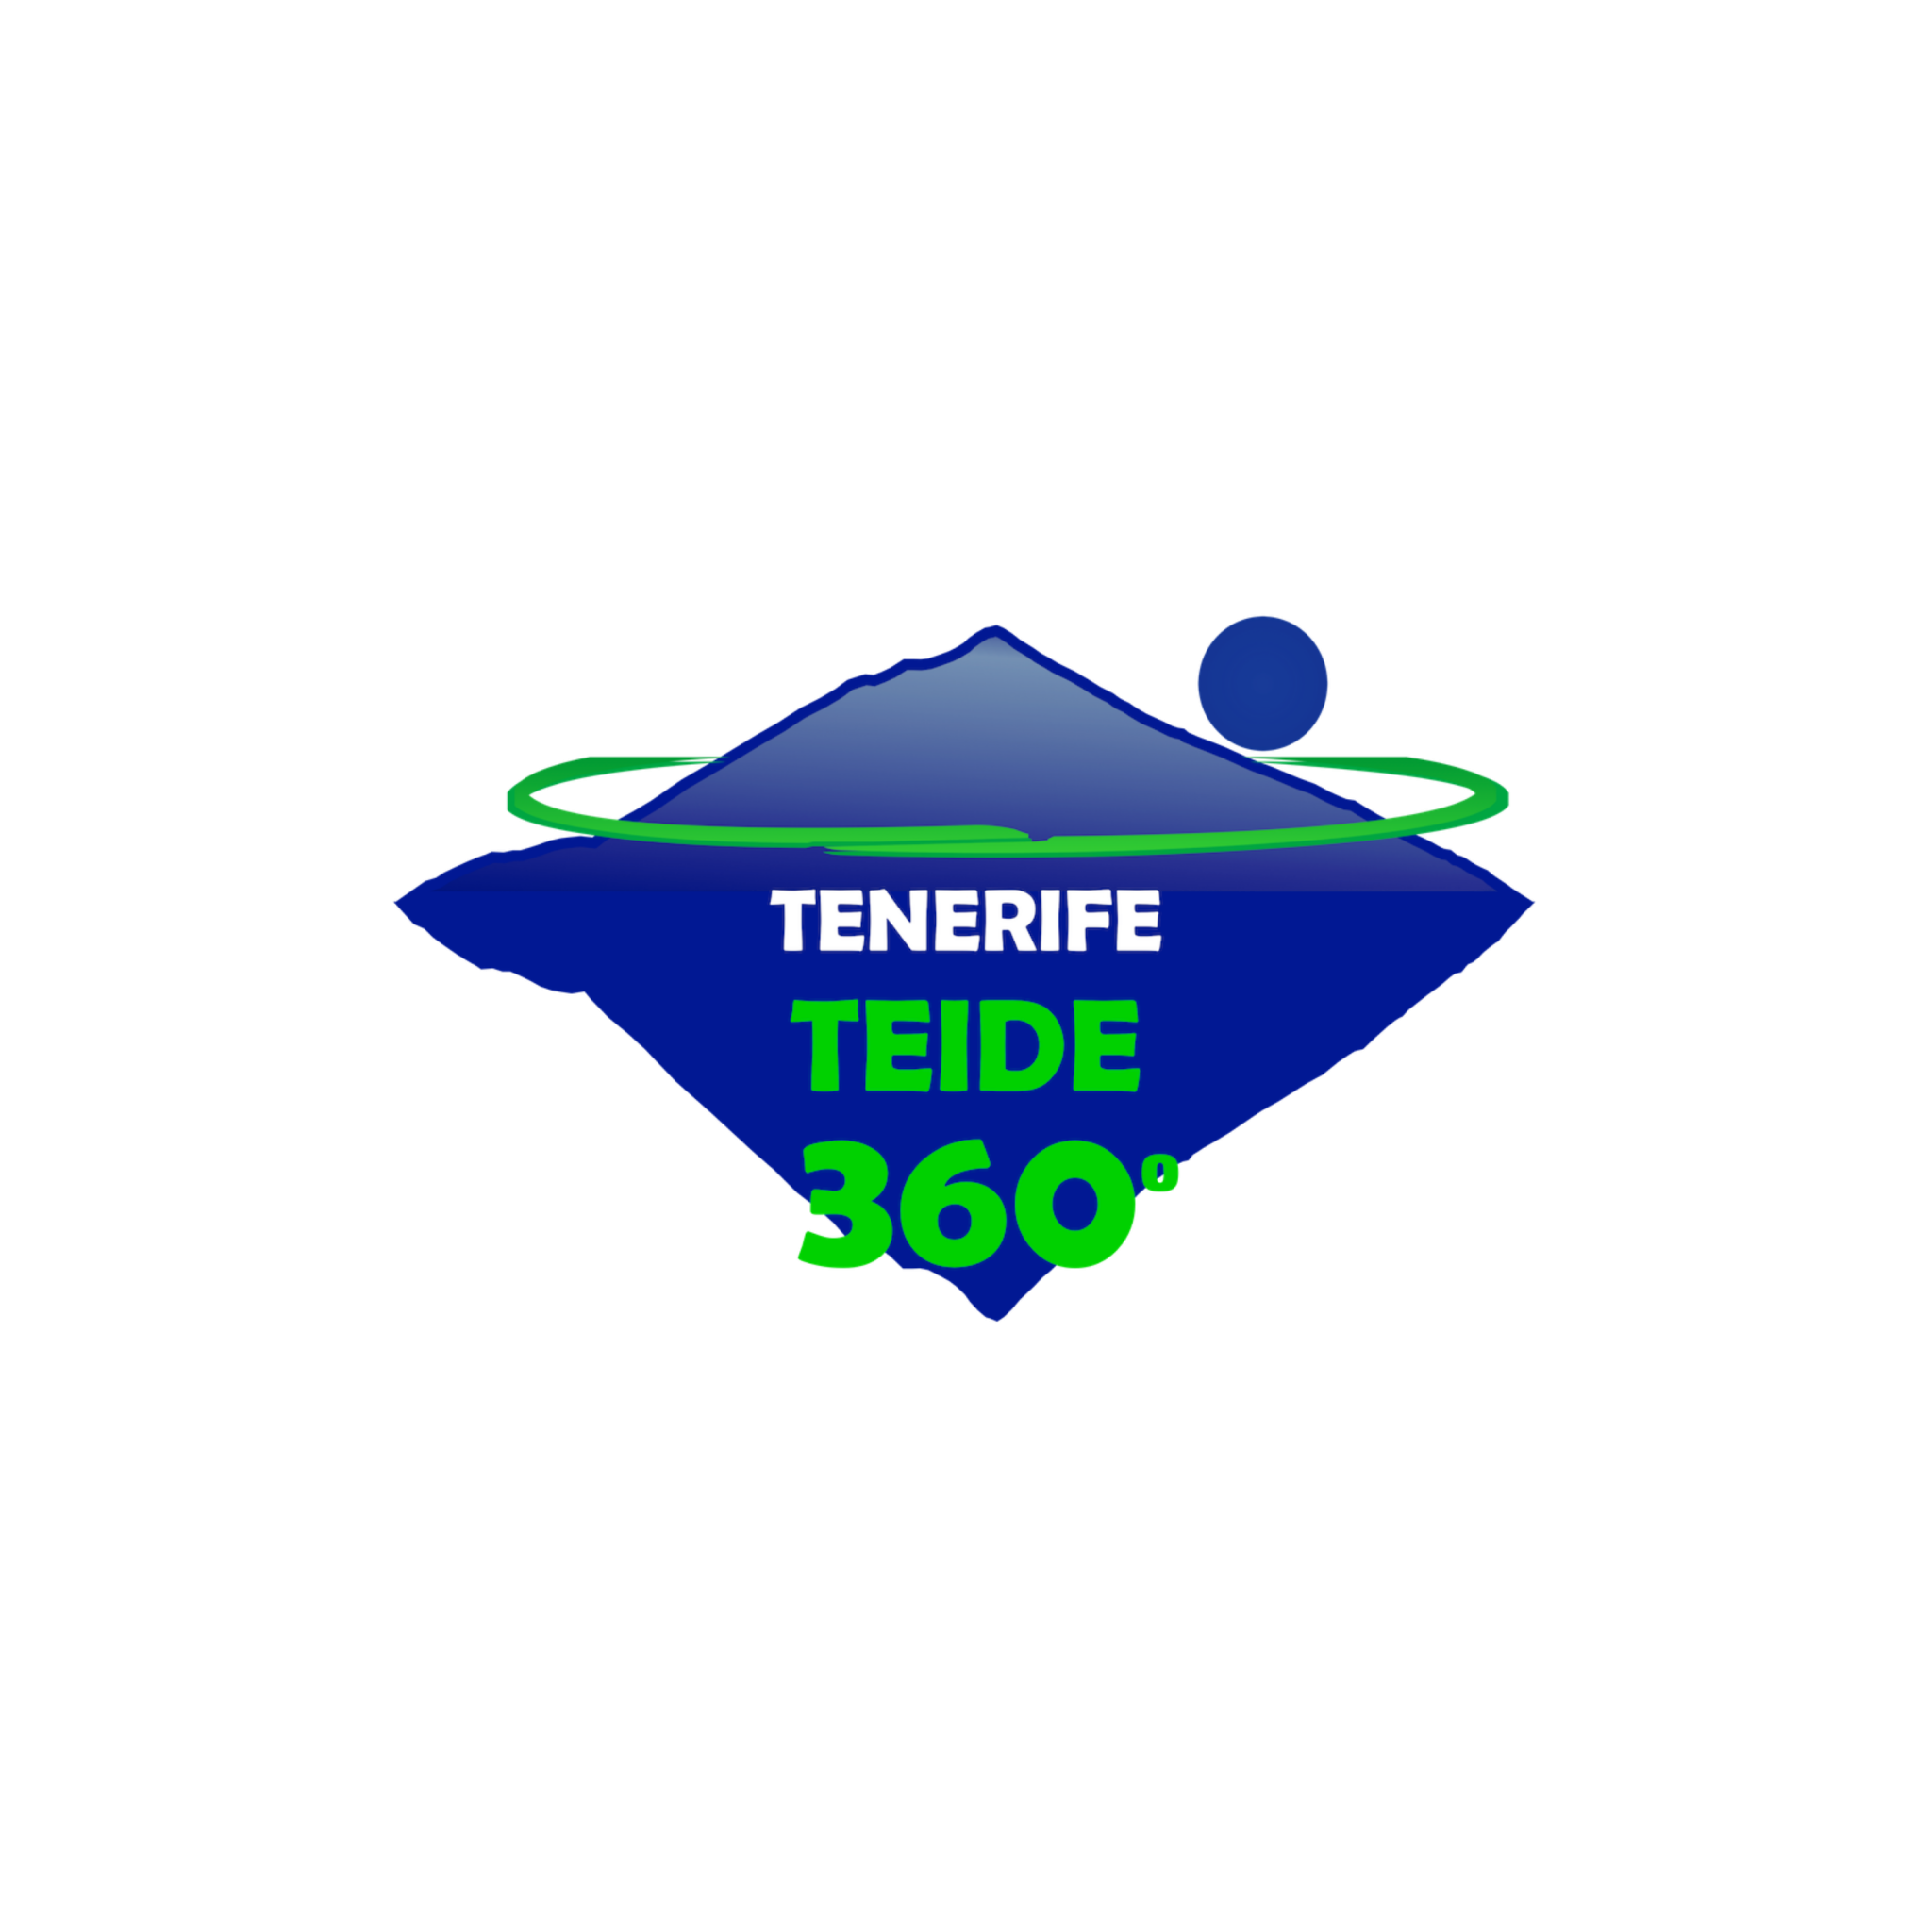 00_logo cuadrado _TT360